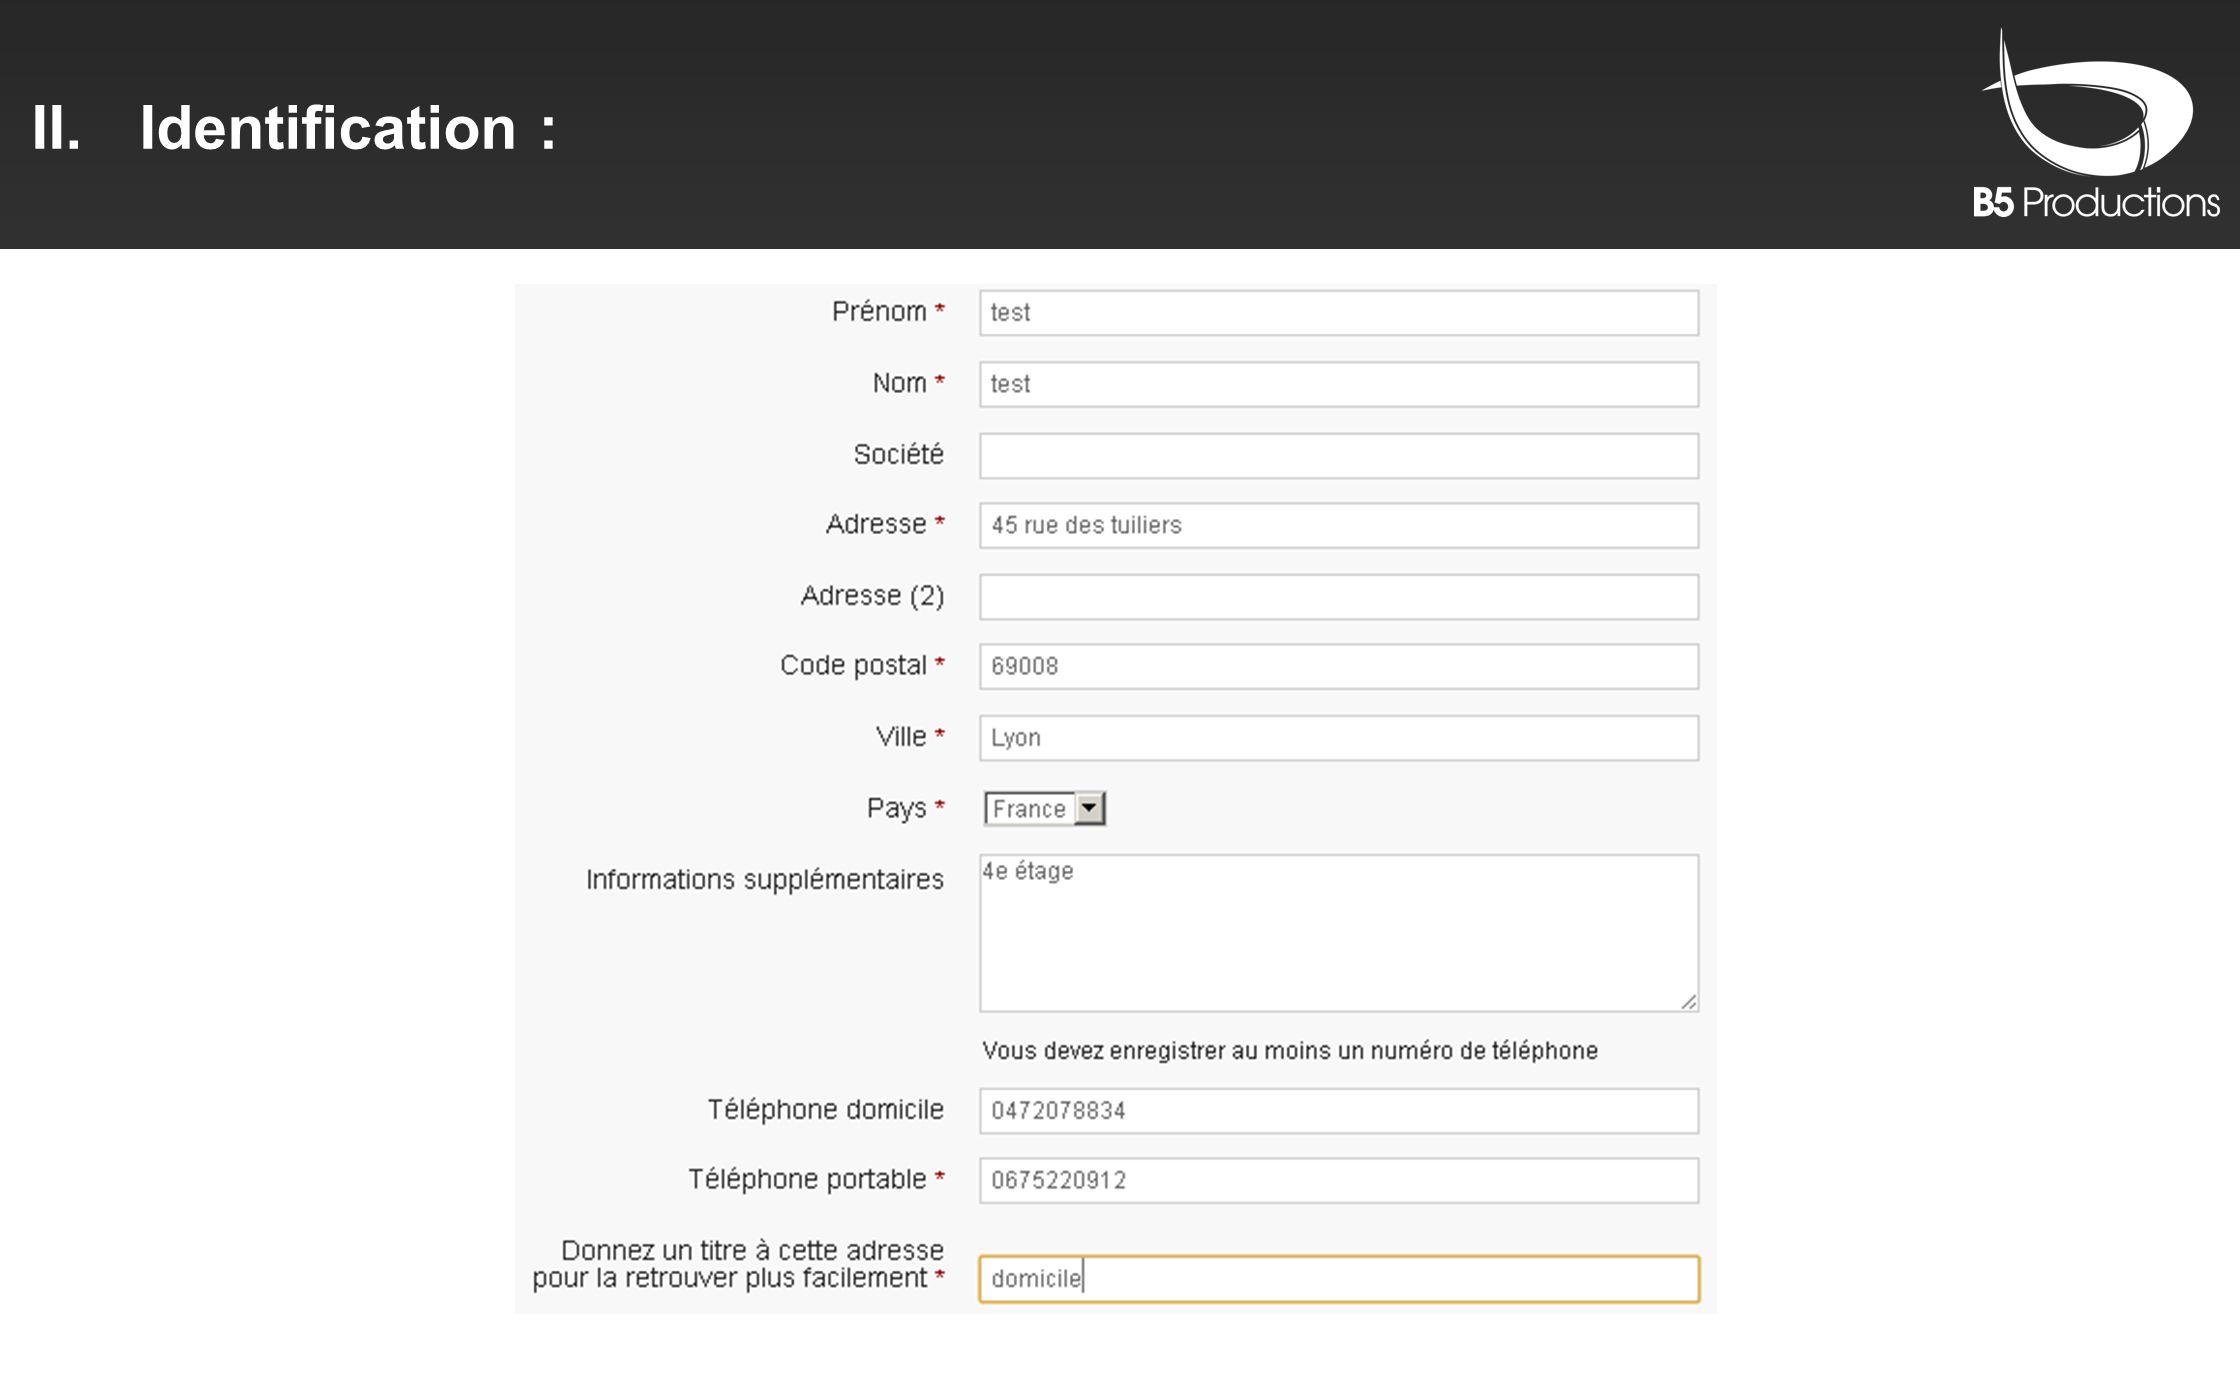 II.Identification :